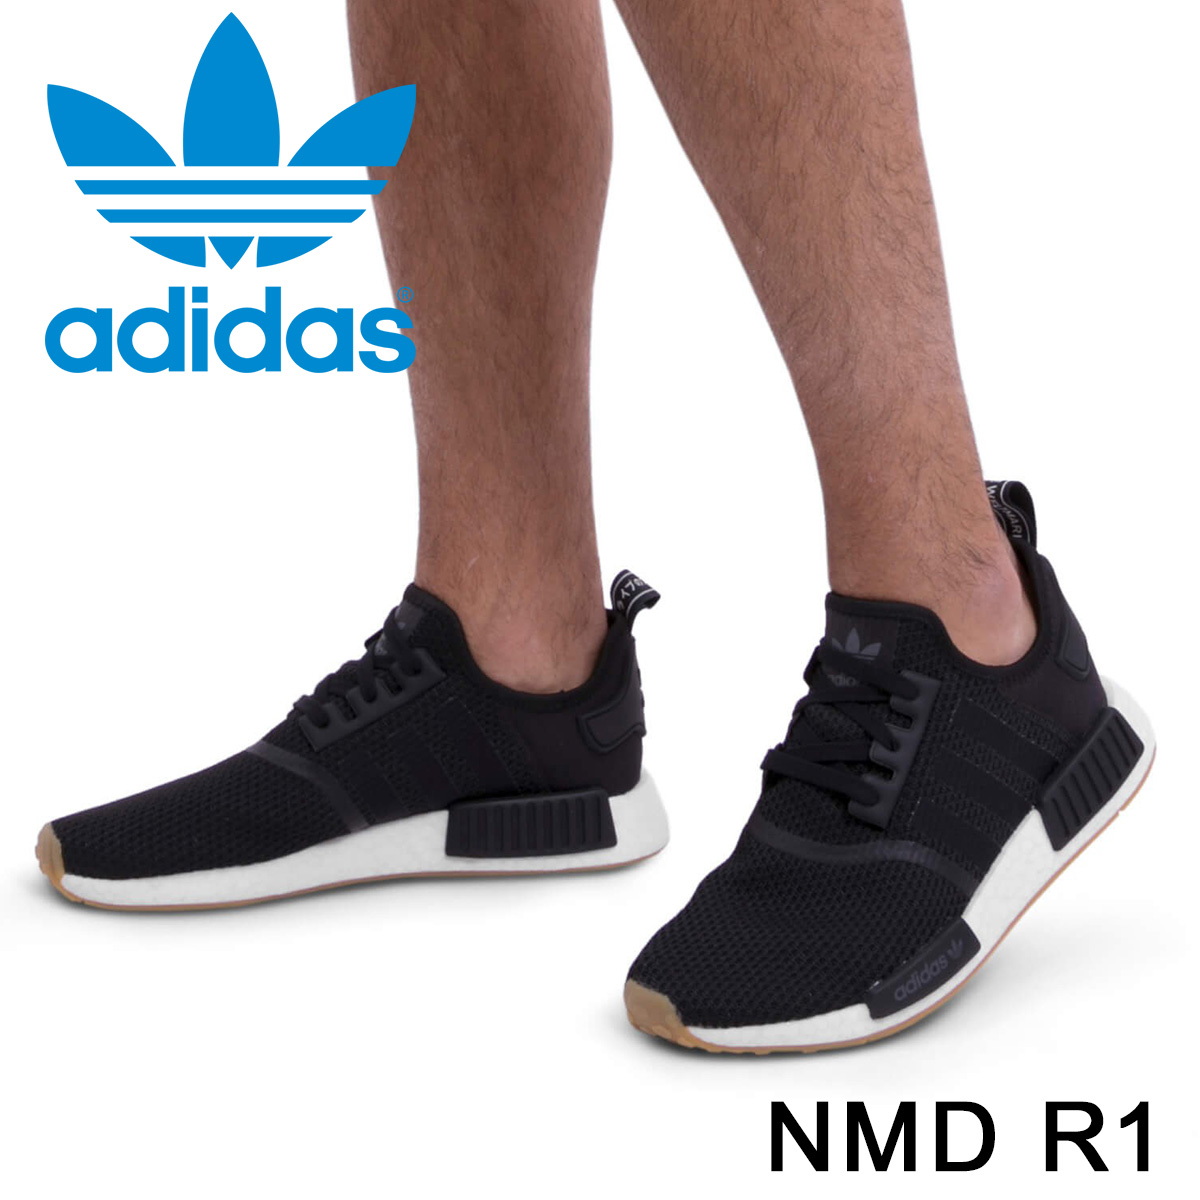 Adidas Originals NMD_R1 B42200 Schwarz